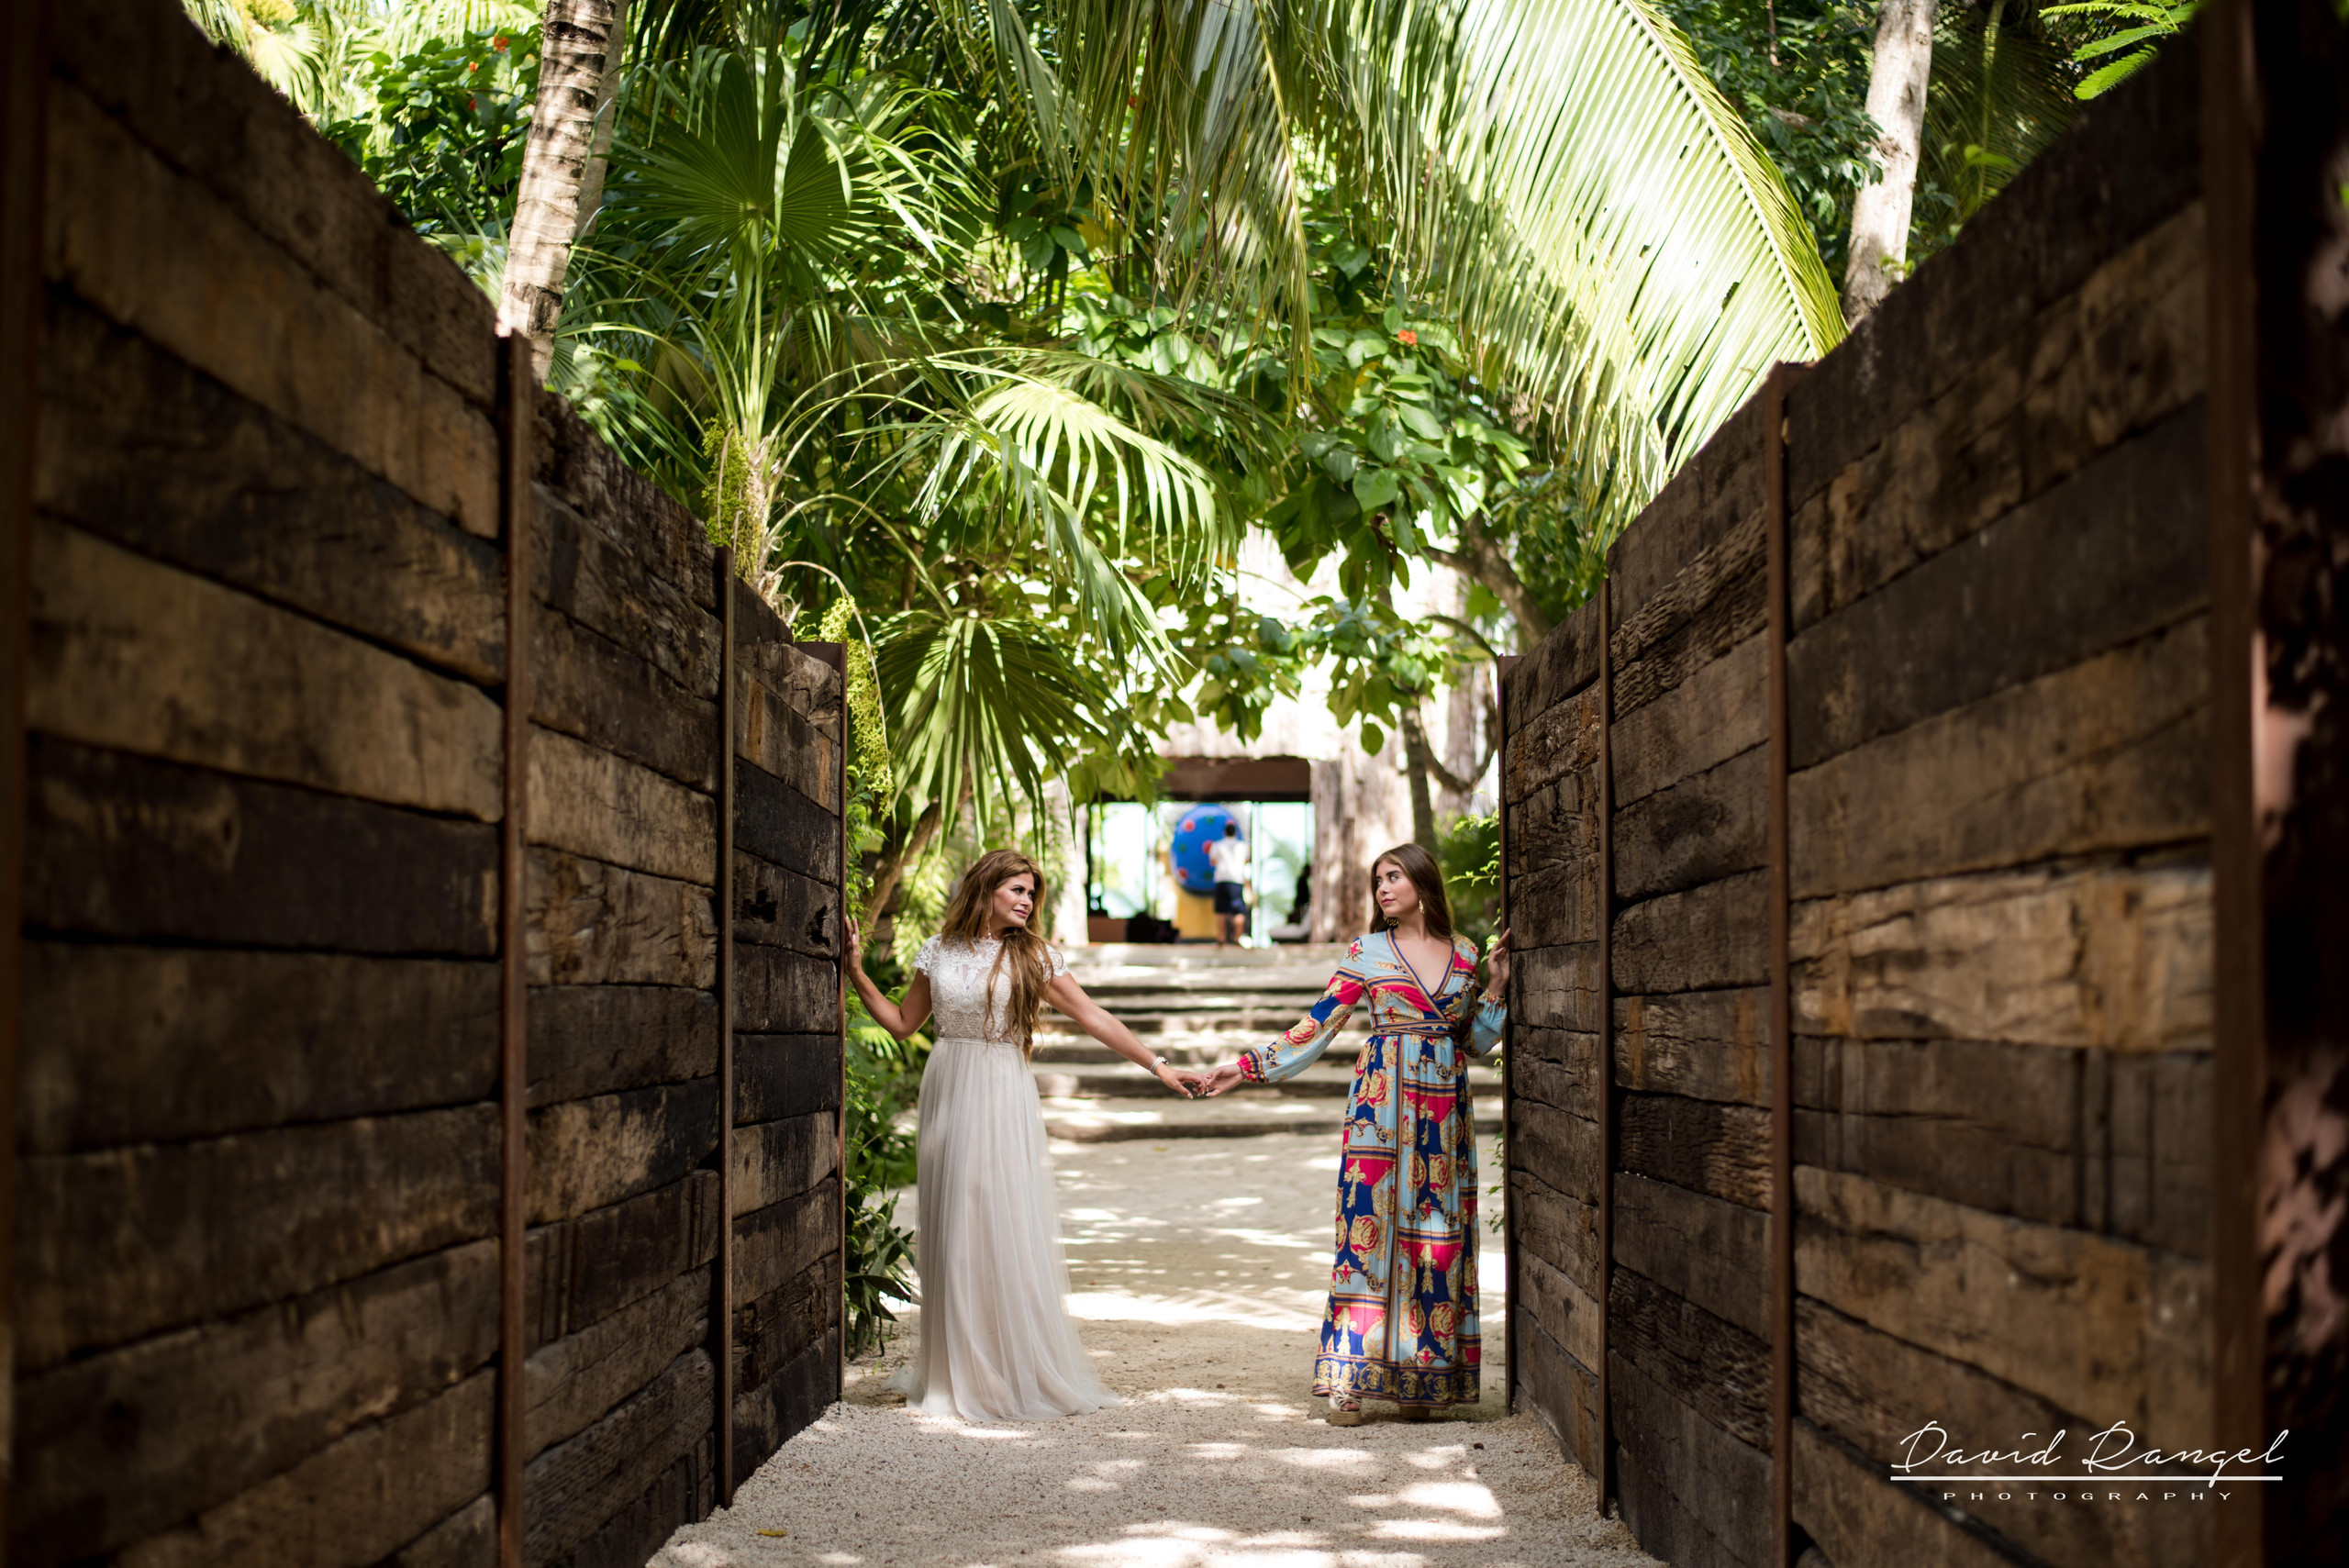 beach+photo+session+tulum+casa+malca+destination+photographer+garden+sand+riviera+maya+girl+woman+photo+picture+model+intimate+david+rangel+photography+photographymnm